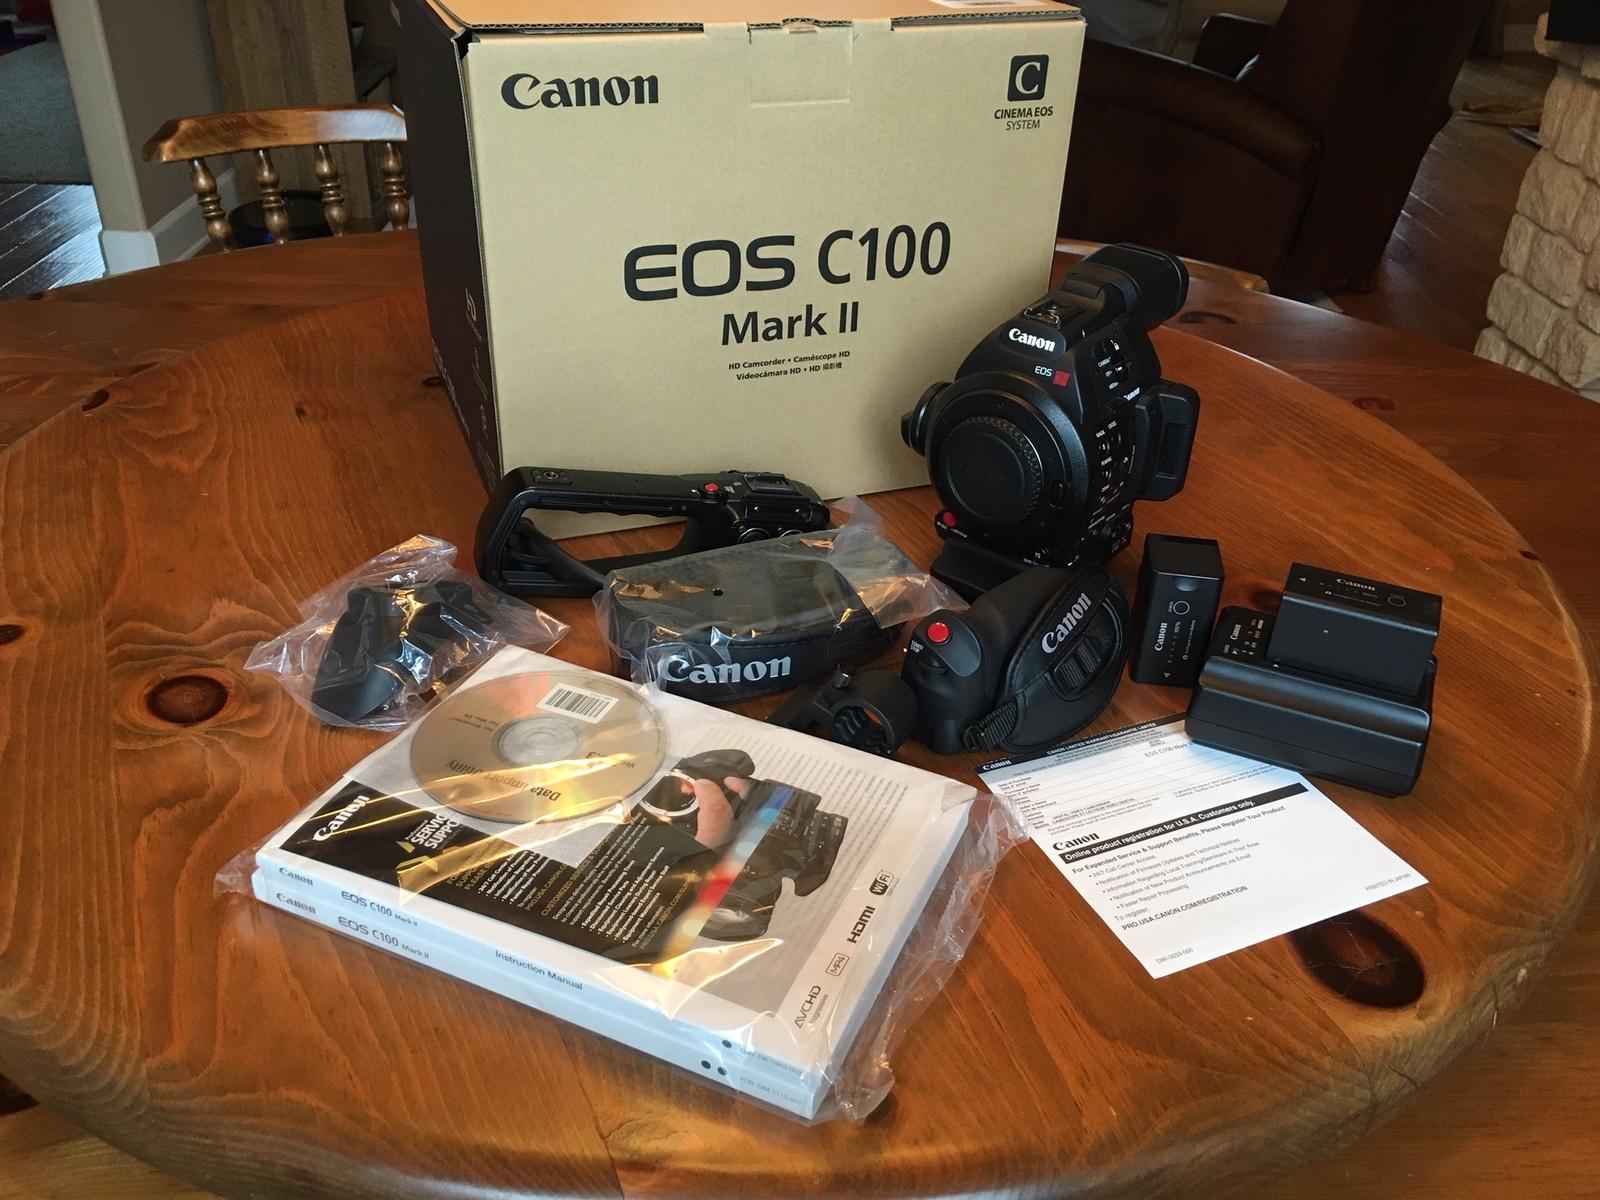 For Sale: Canon EOS C100 Mark II | ShareGrid